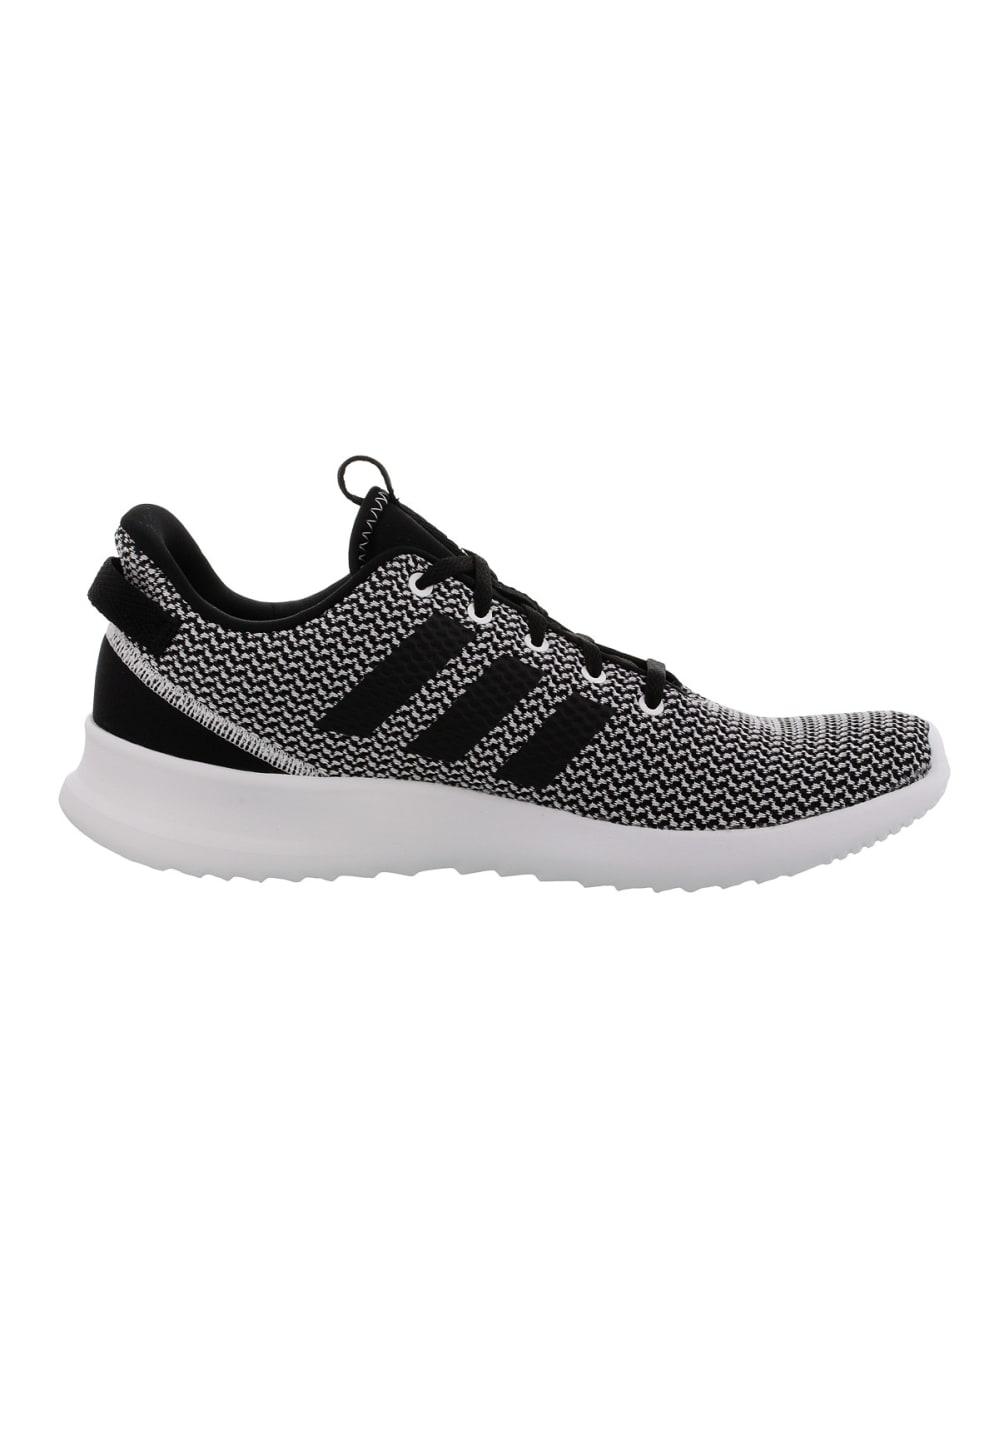 new product 7c494 d6197 Next. -60%. adidas neo. Cf Racer Tr - Zapatillas de running para Hombre